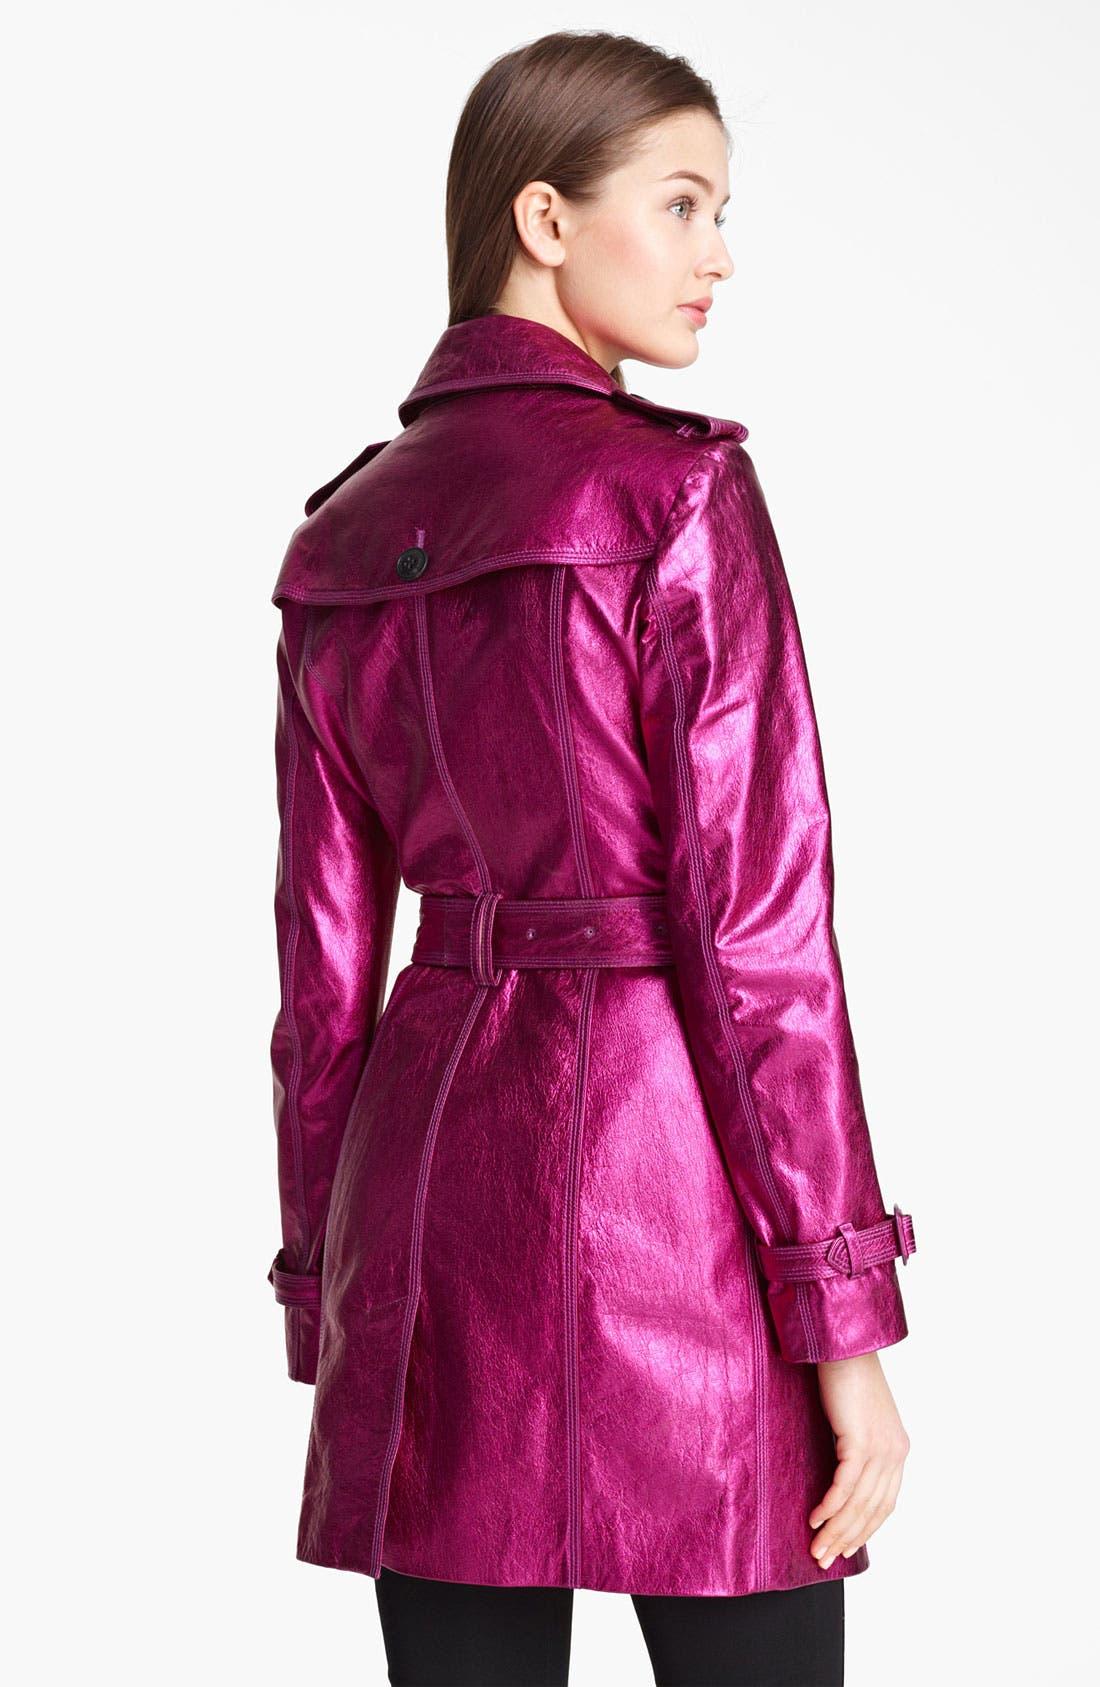 London Metallic Leather Trench Coat,                             Alternate thumbnail 3, color,                             652